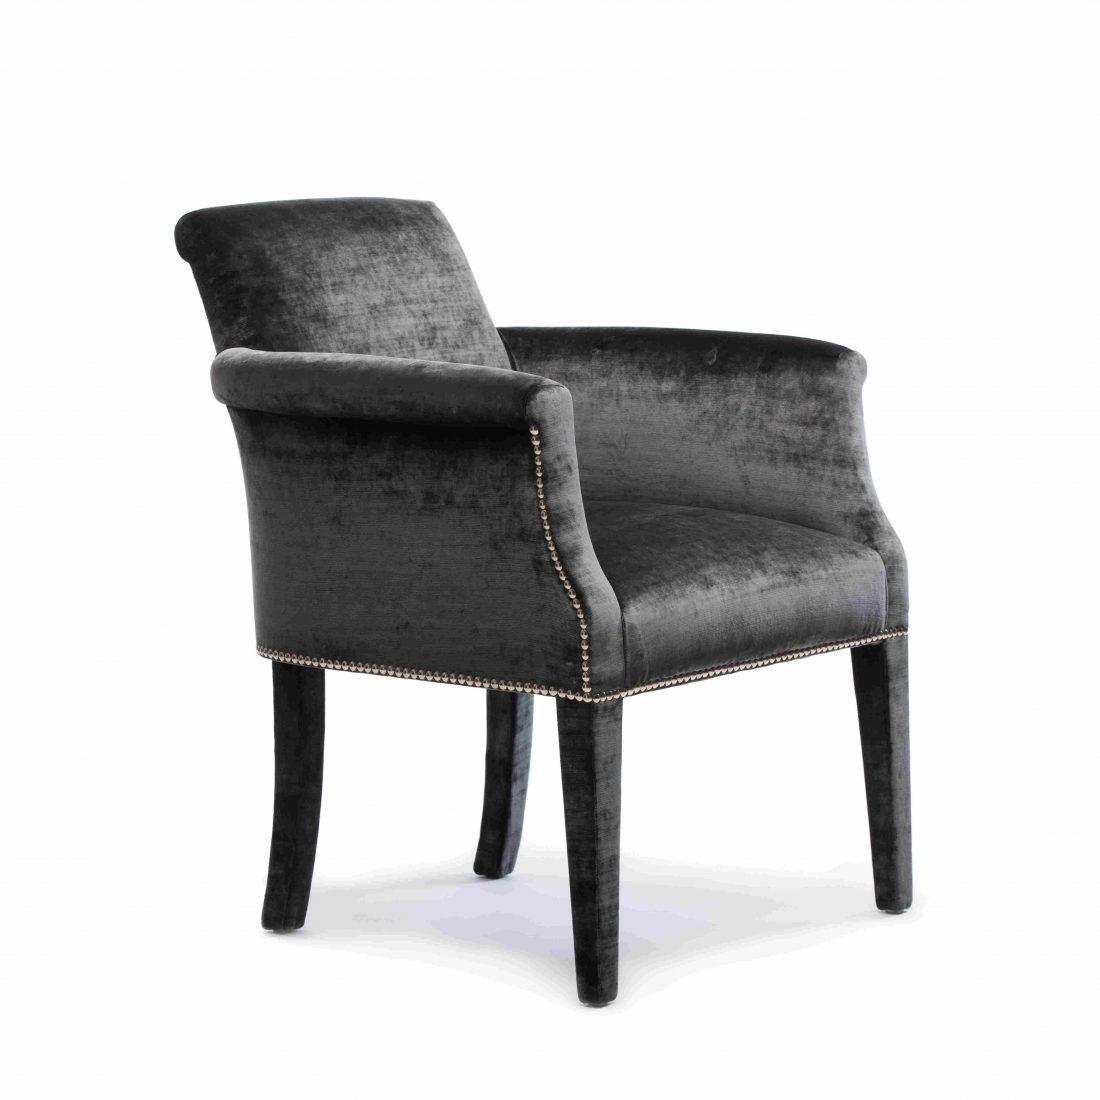 Hudson Chair The Odd Chair Company : Hudson Chair Showood 3 Quarters 1100x1100 from www.theoddchaircompany.com size 1100 x 1100 jpeg 61kB